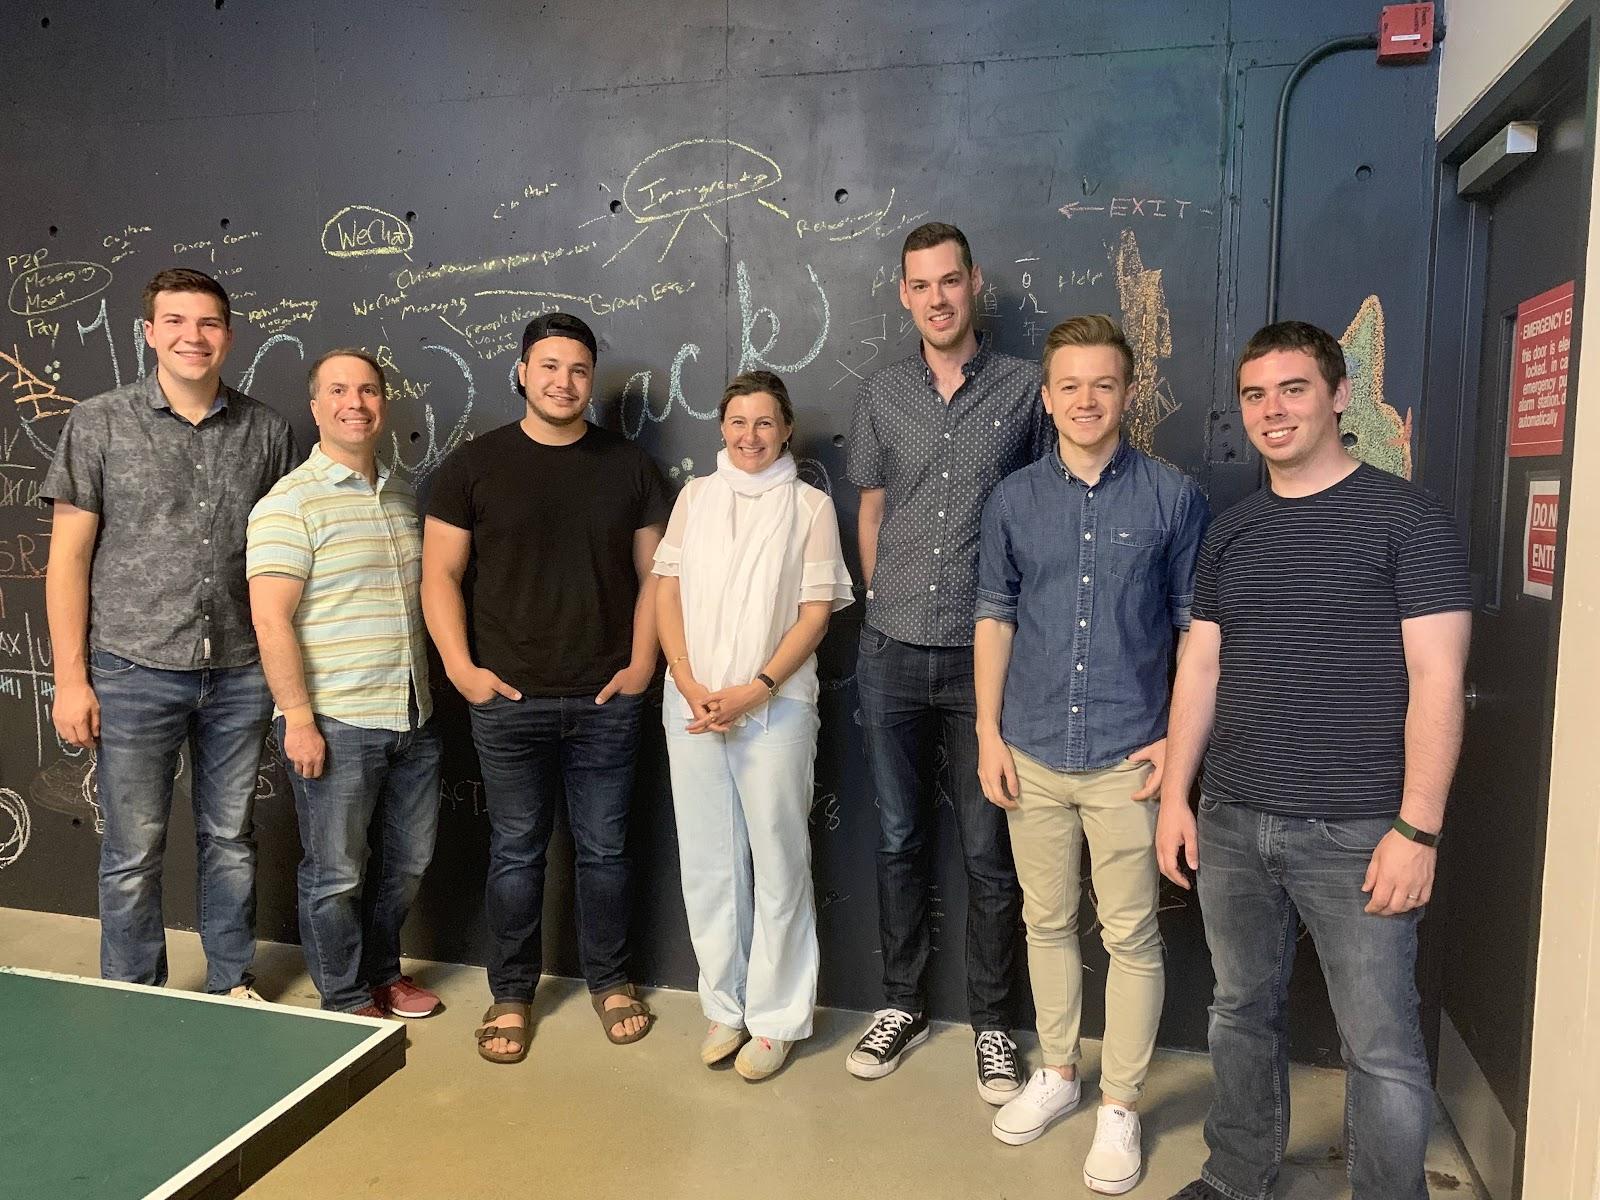 Jargon team photo